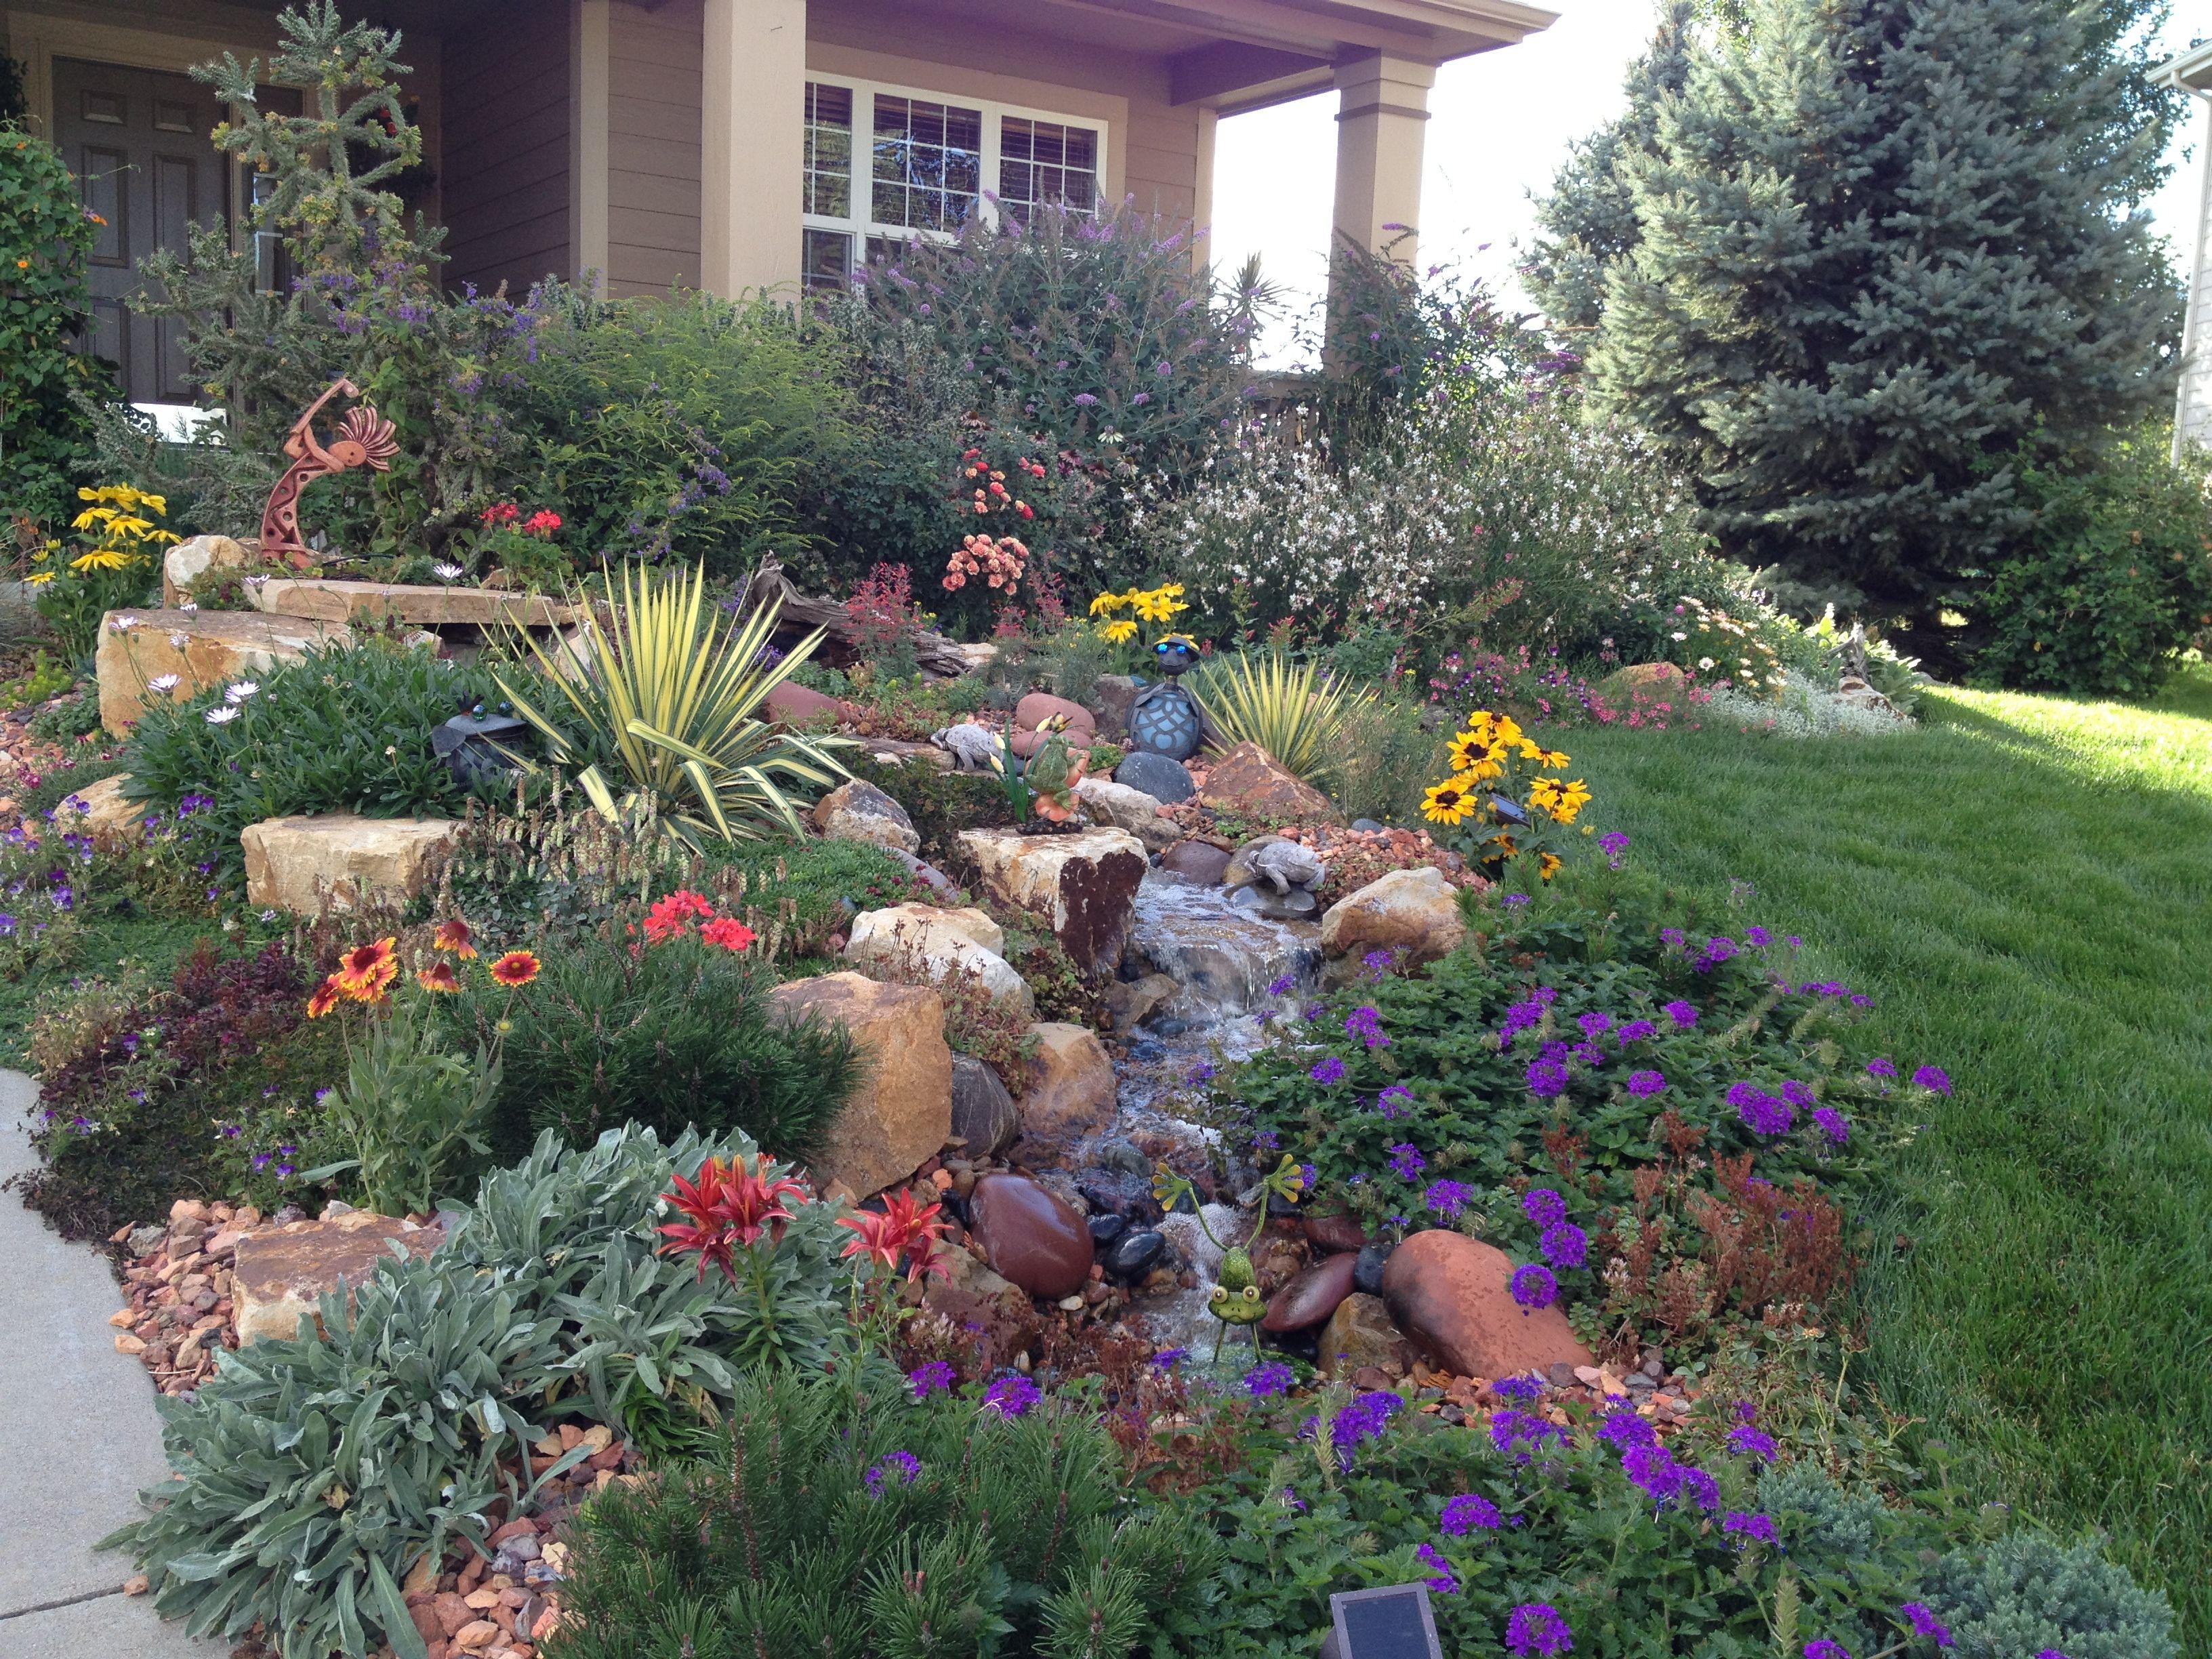 Landscape Designer Colorado Vista Landscape Design Inc Windsor Fort Collins Colorado Landscape Landscaper L Xeriscape Sustainable Landscaping Xeriscape Plants